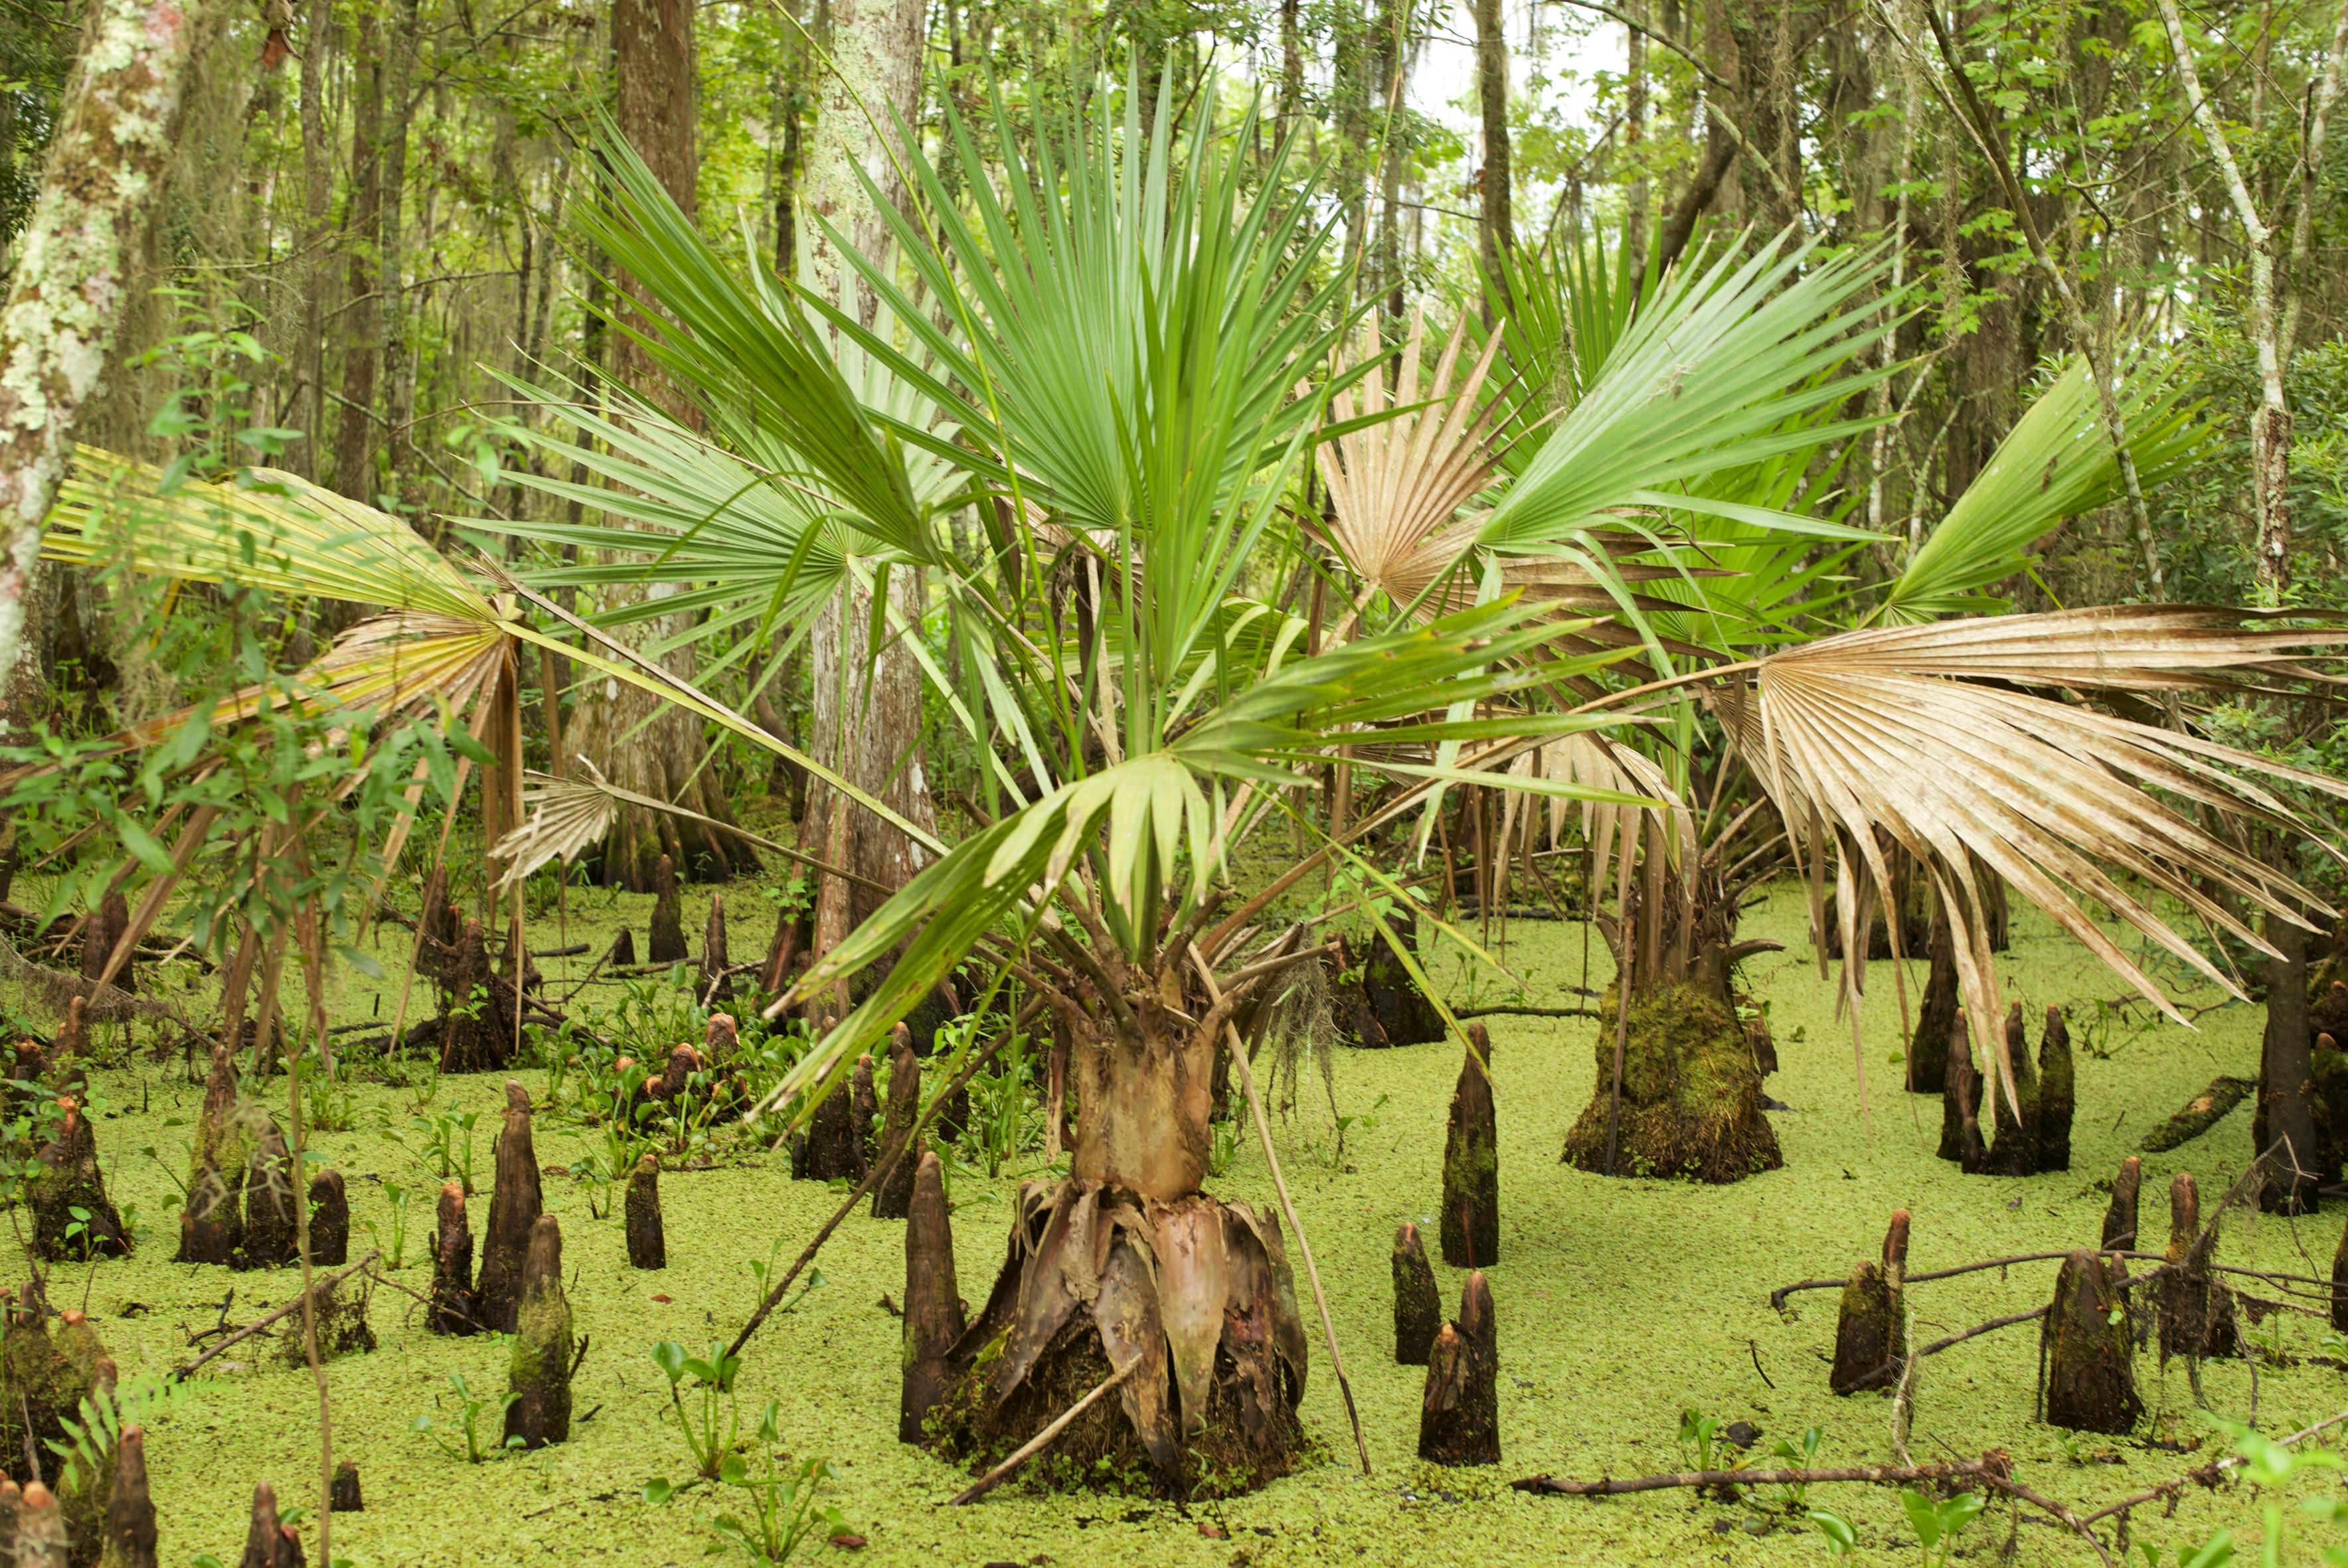 New Orleans, swamp